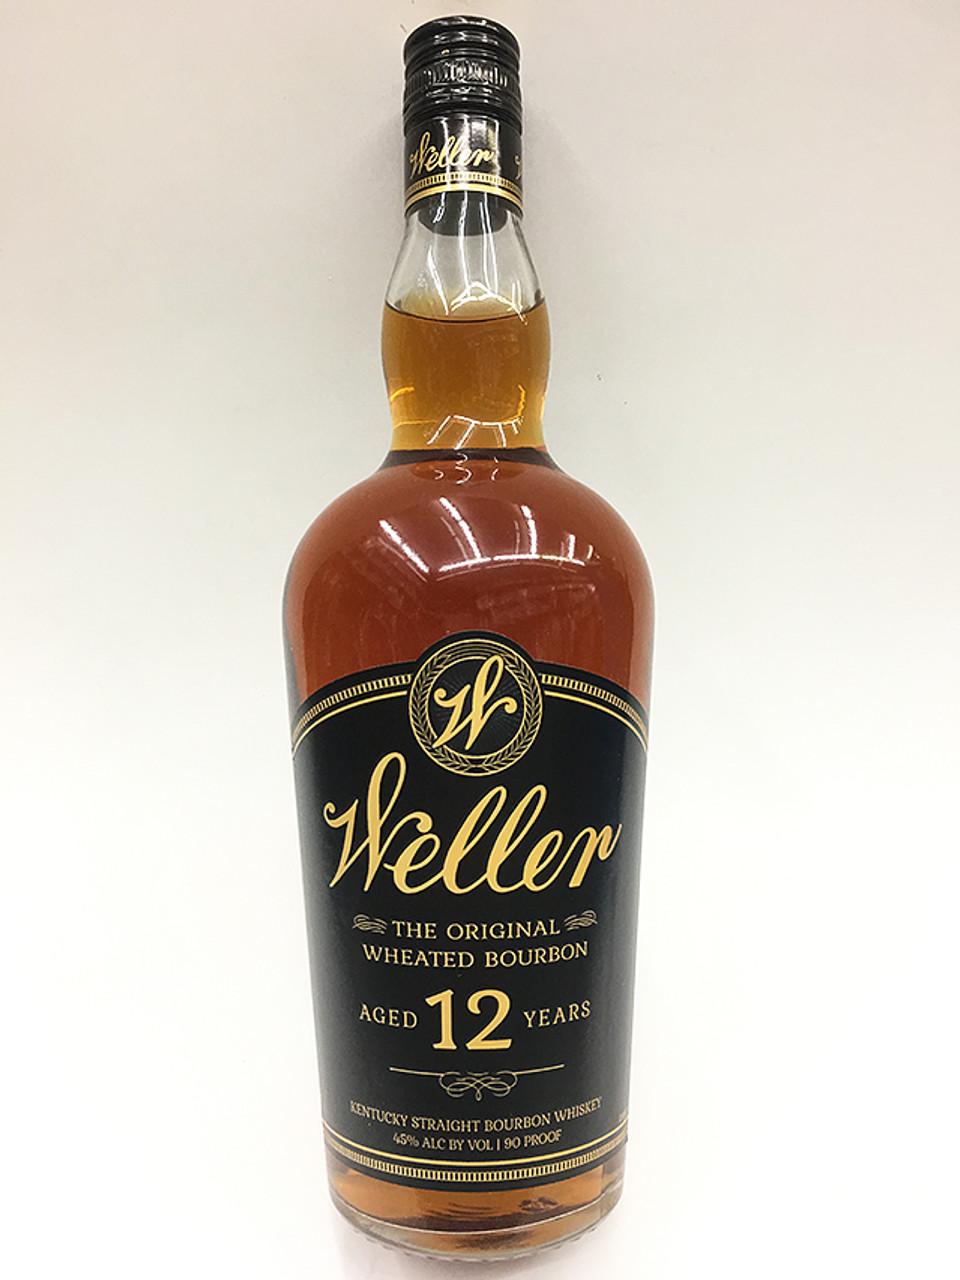 Wl Weller 12 Year 750ml